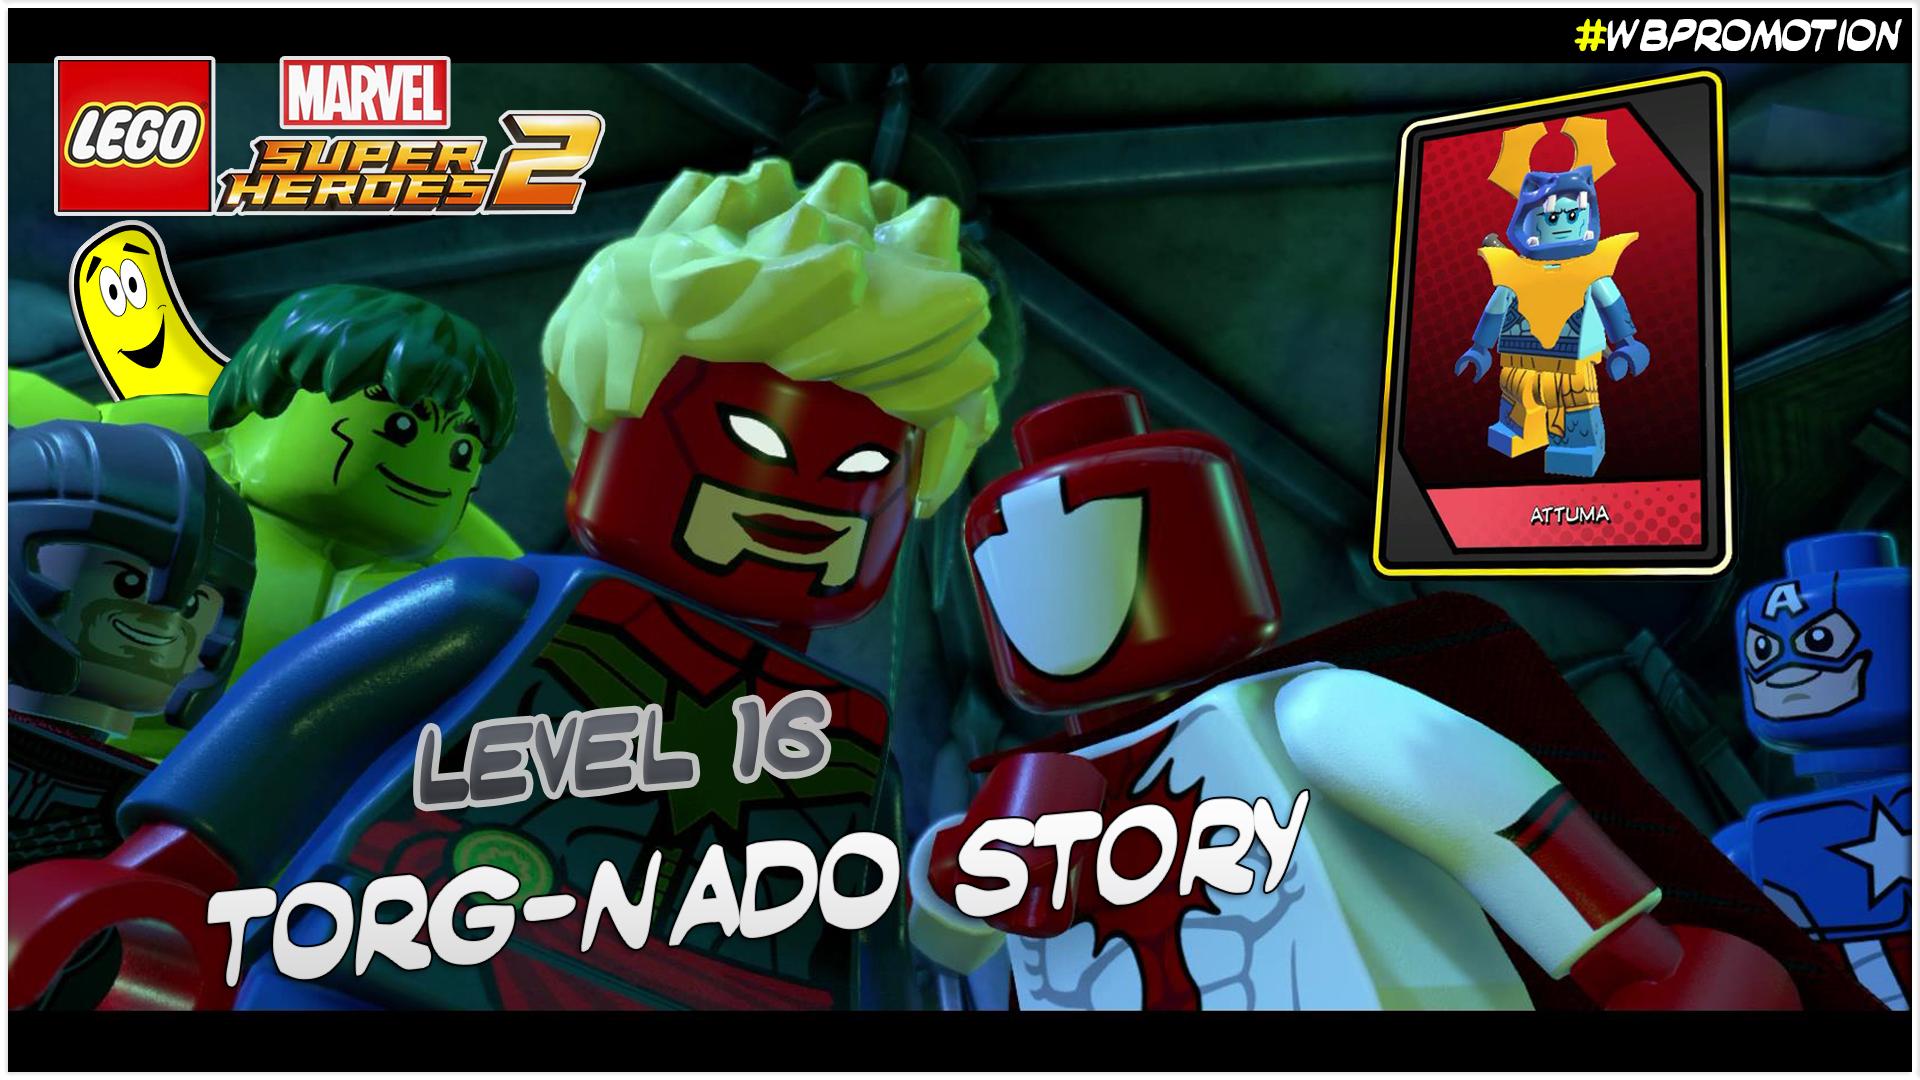 Lego Marvel Superheroes 2: Level 16 / Torg-Nado STORY – HTG